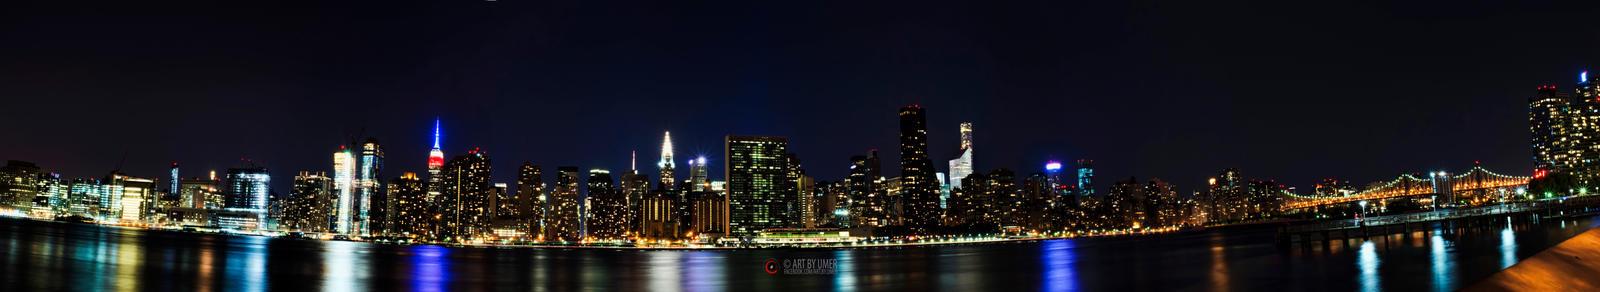 New York City by umerr2000